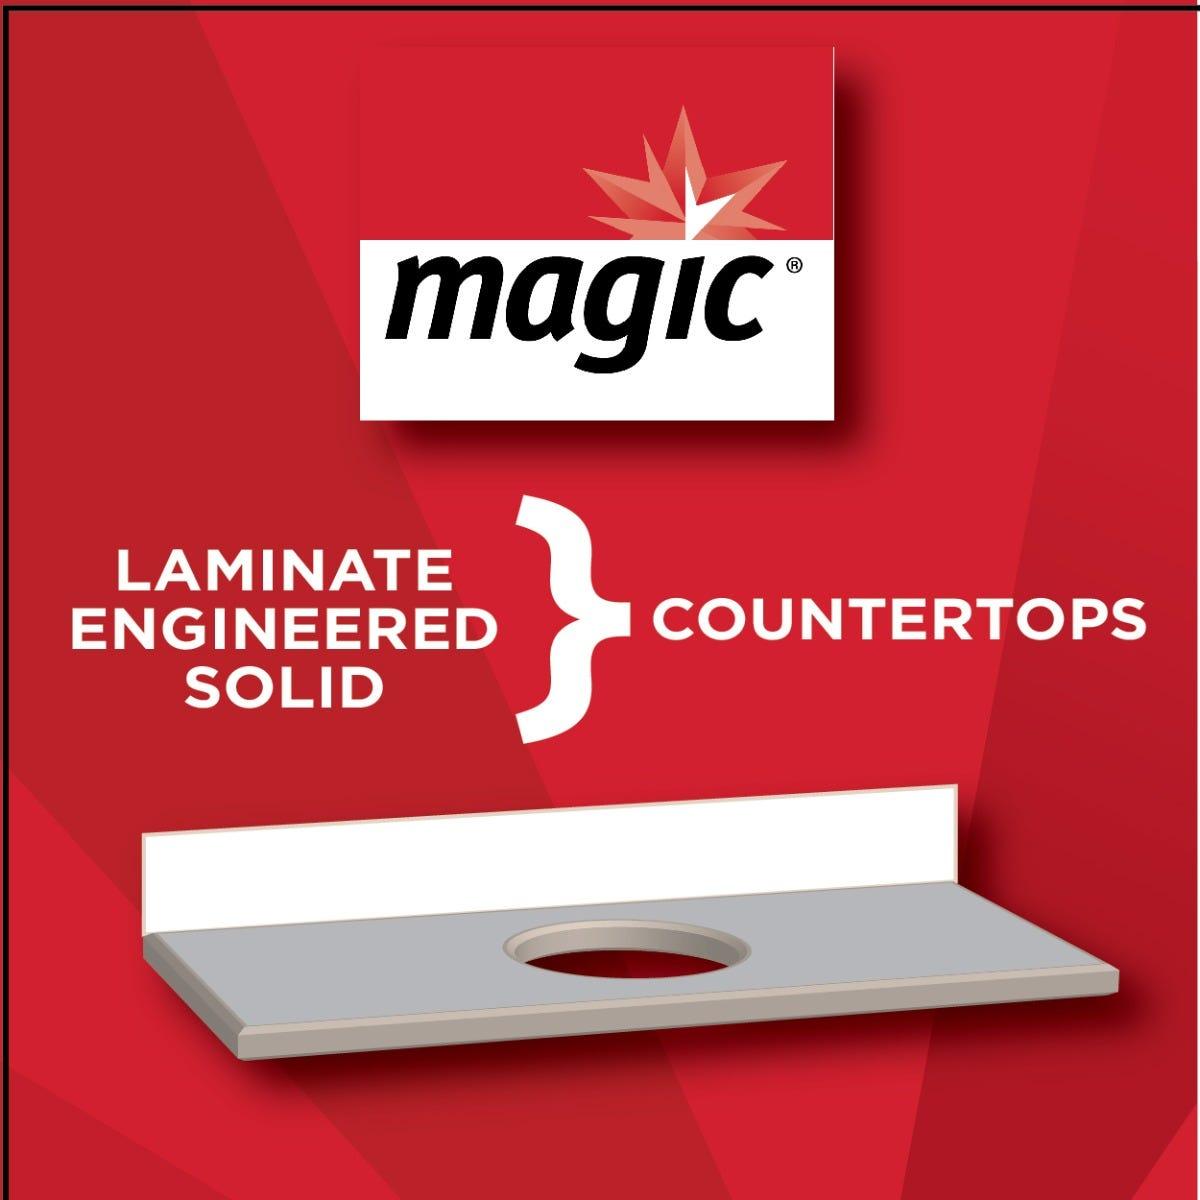 https://googone.com/media/catalog/product/m/a/magic_countertop_cleaner_spray_laminate.jpg